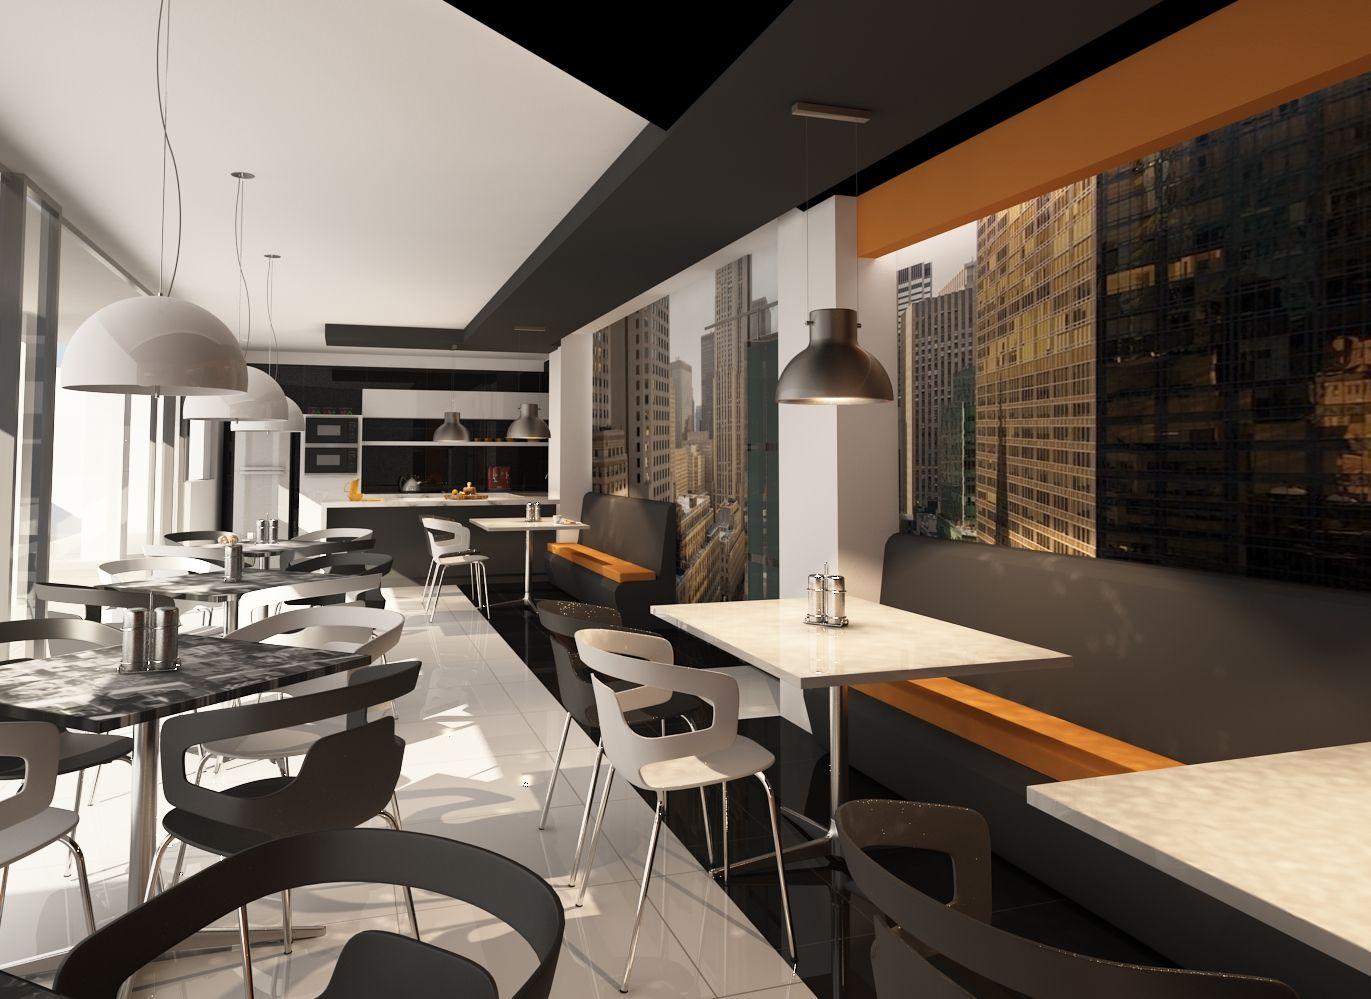 Diseno Comercial Cafeteria Moderno Contemporaneo Decoracion Casa - Diseo-cafeterias-modernas